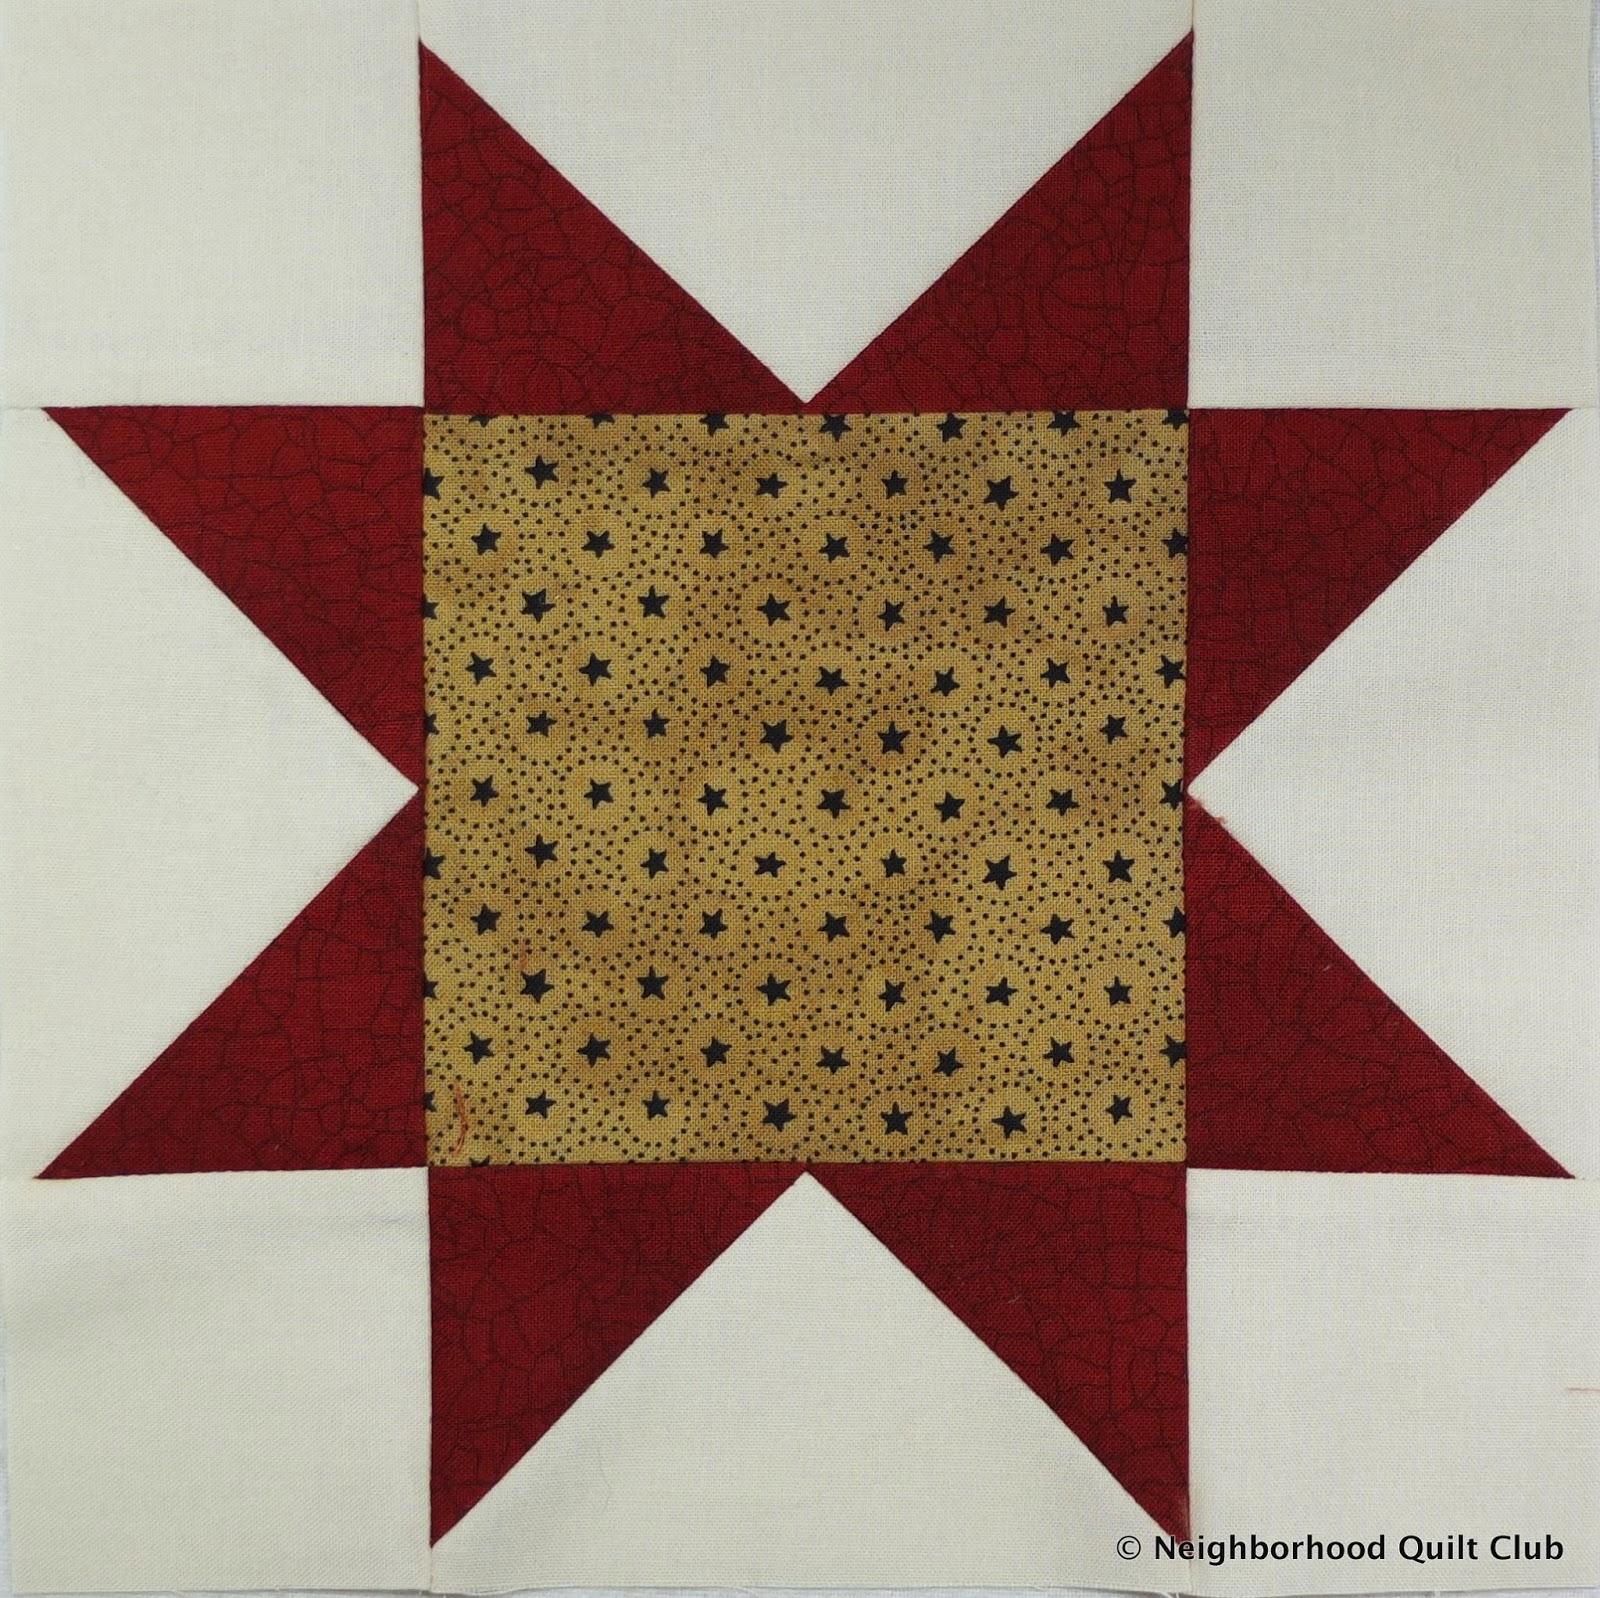 North Star - Quilt Block Tutorial